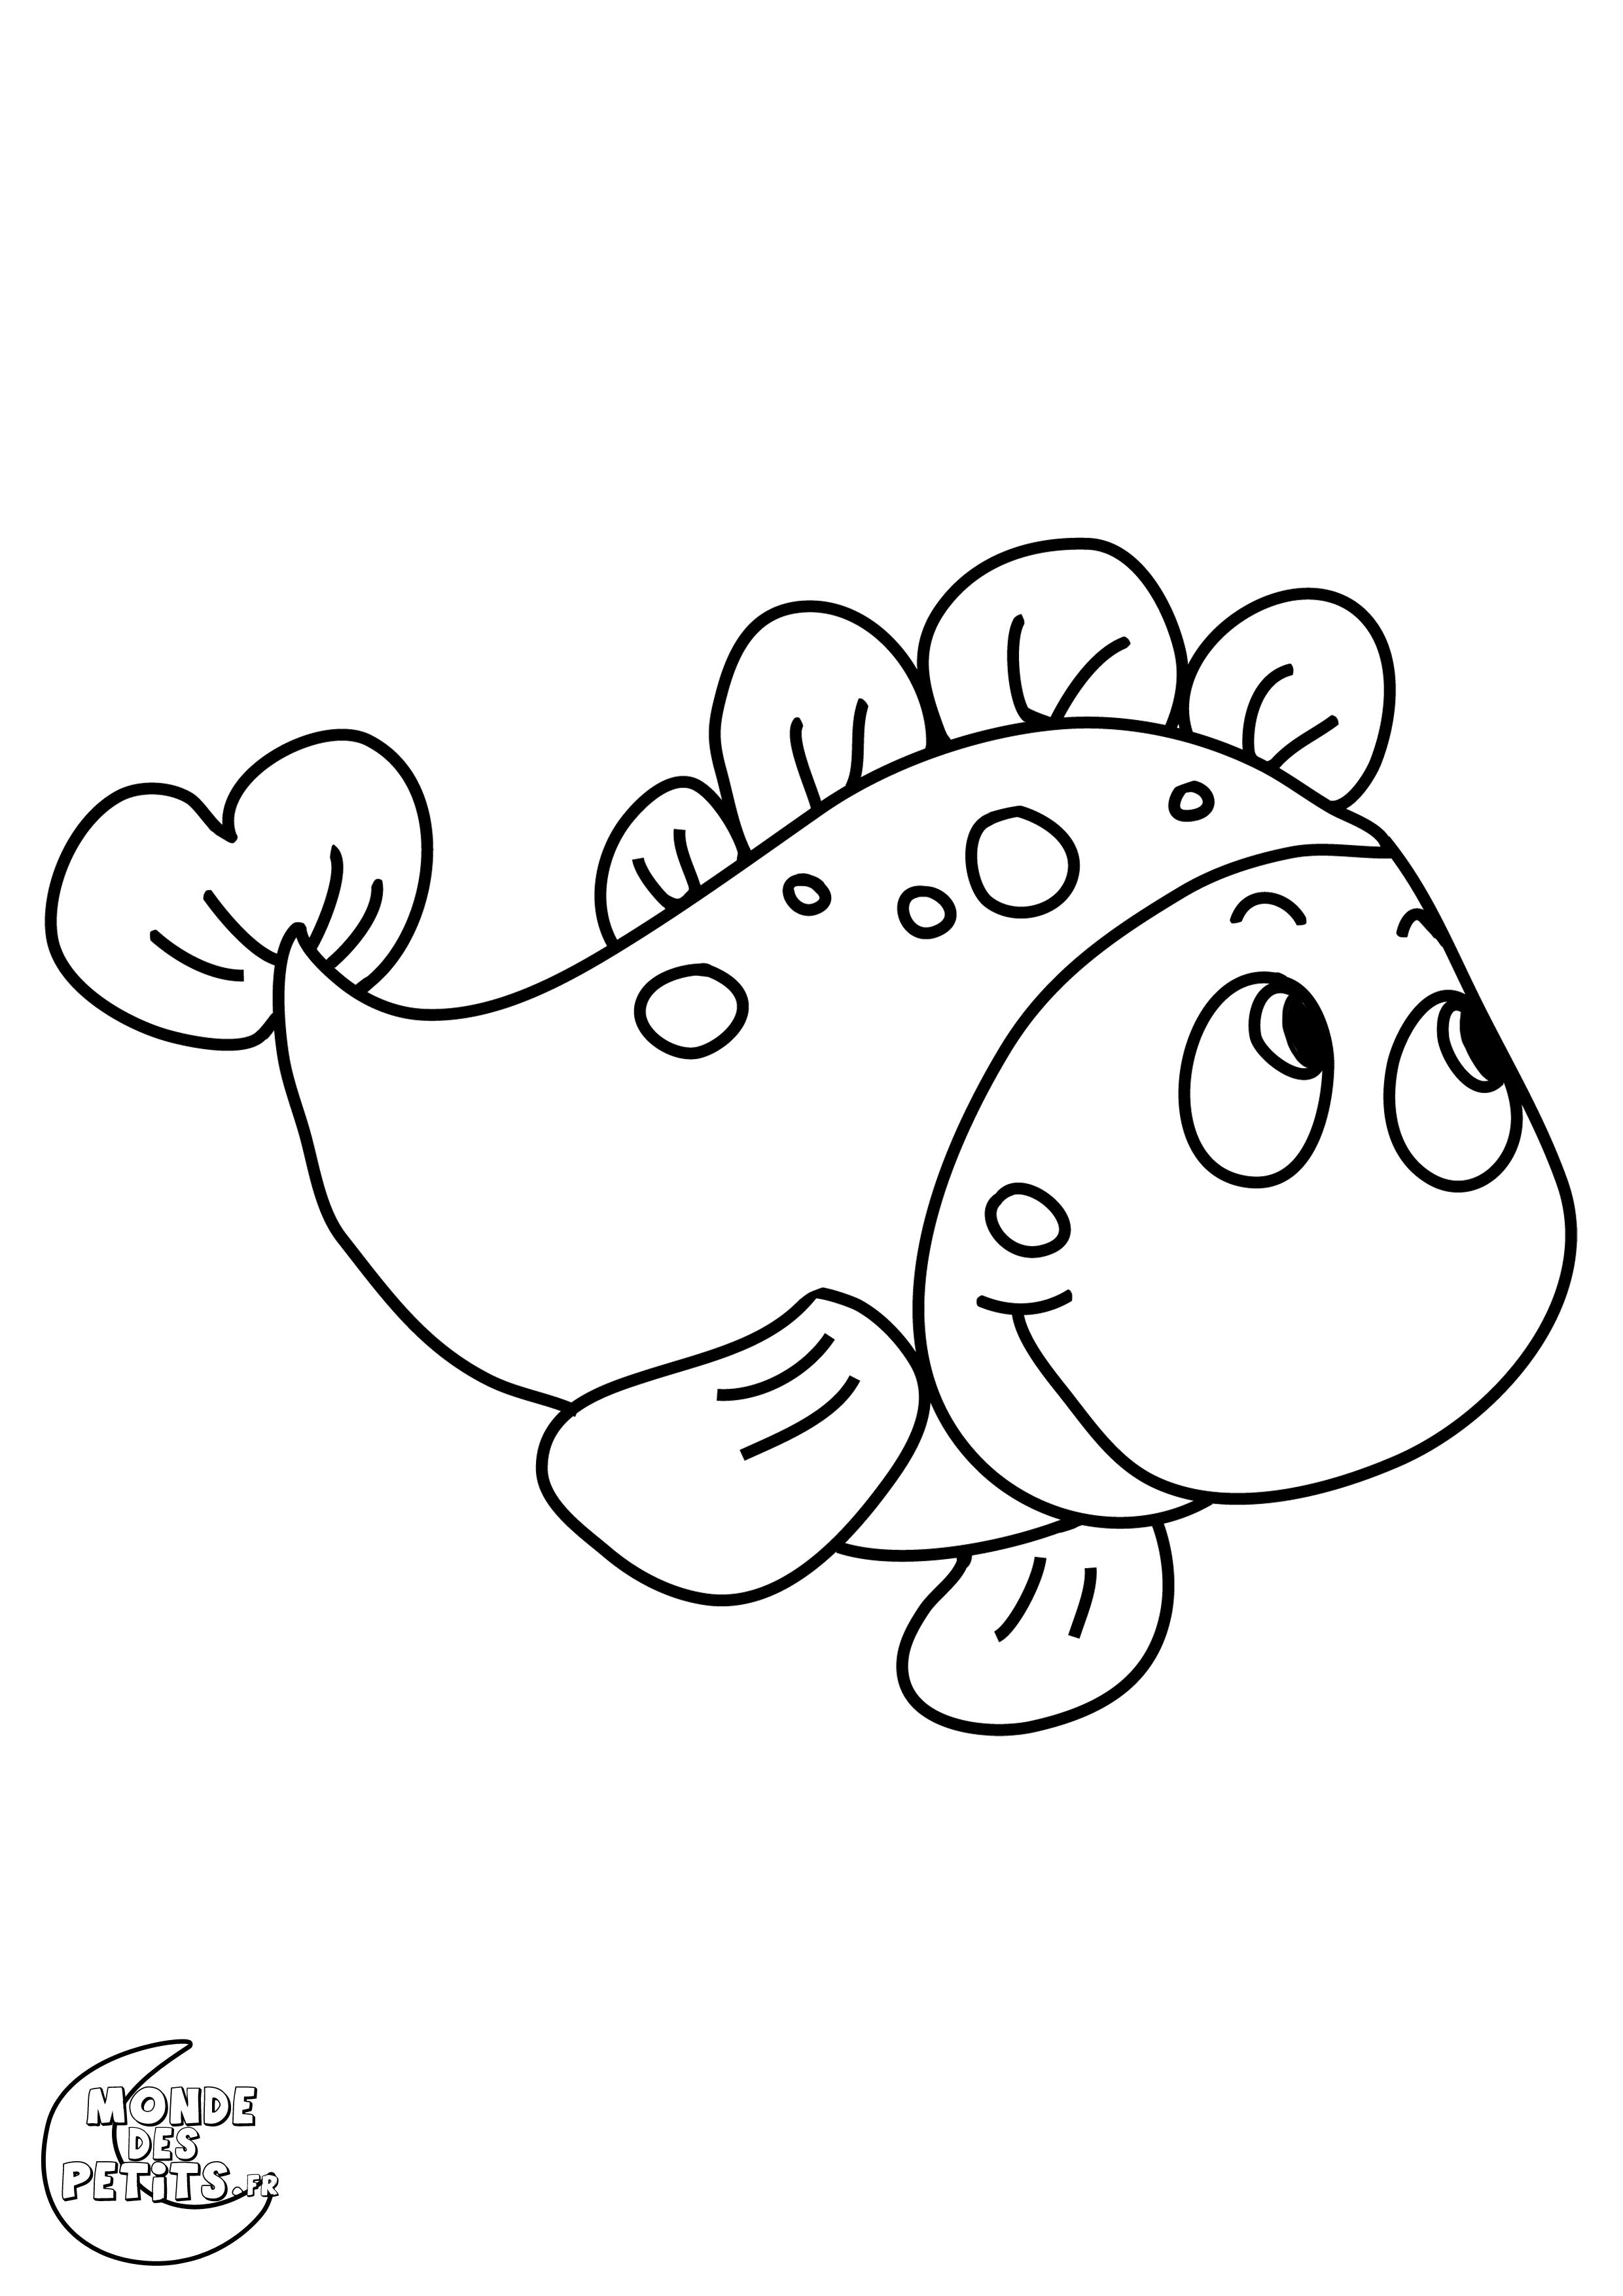 Génial Bebe Animaux Coloriage Poisson